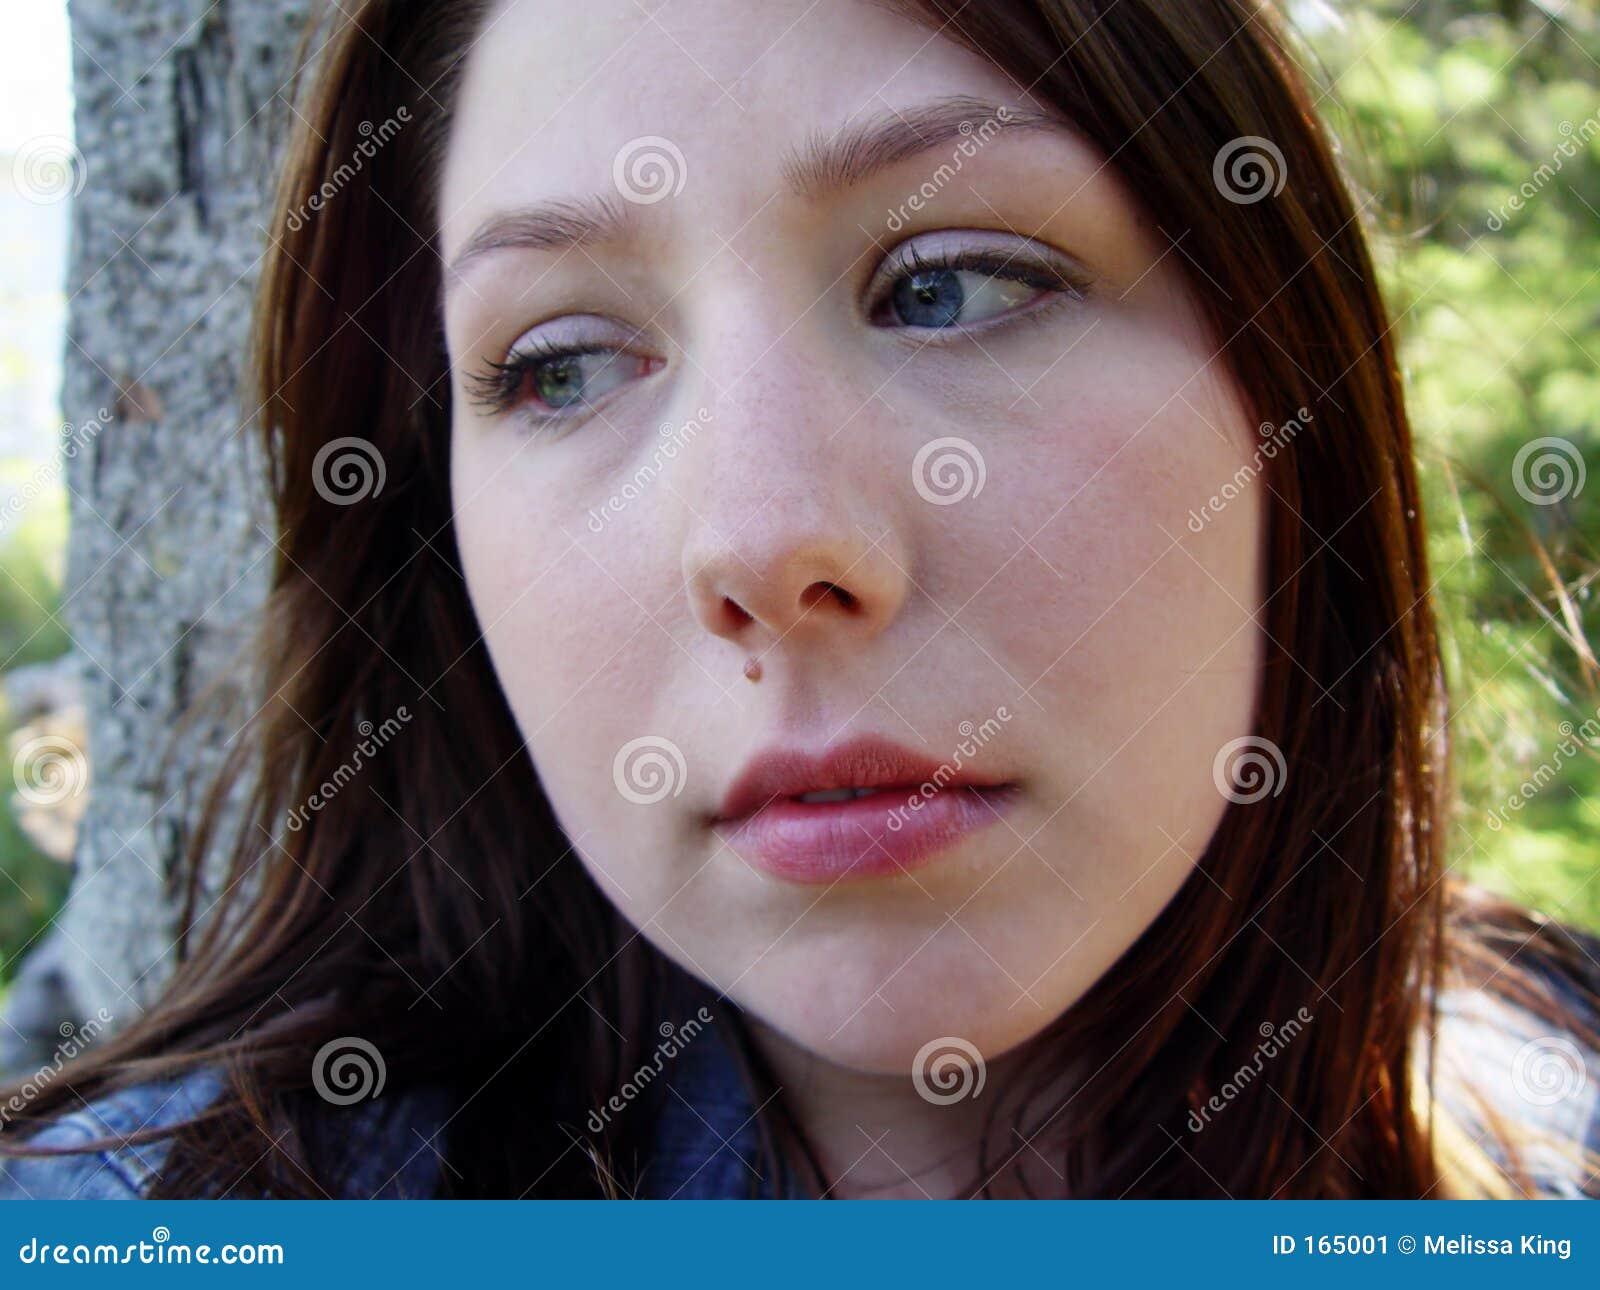 Young Woman Looking Sad